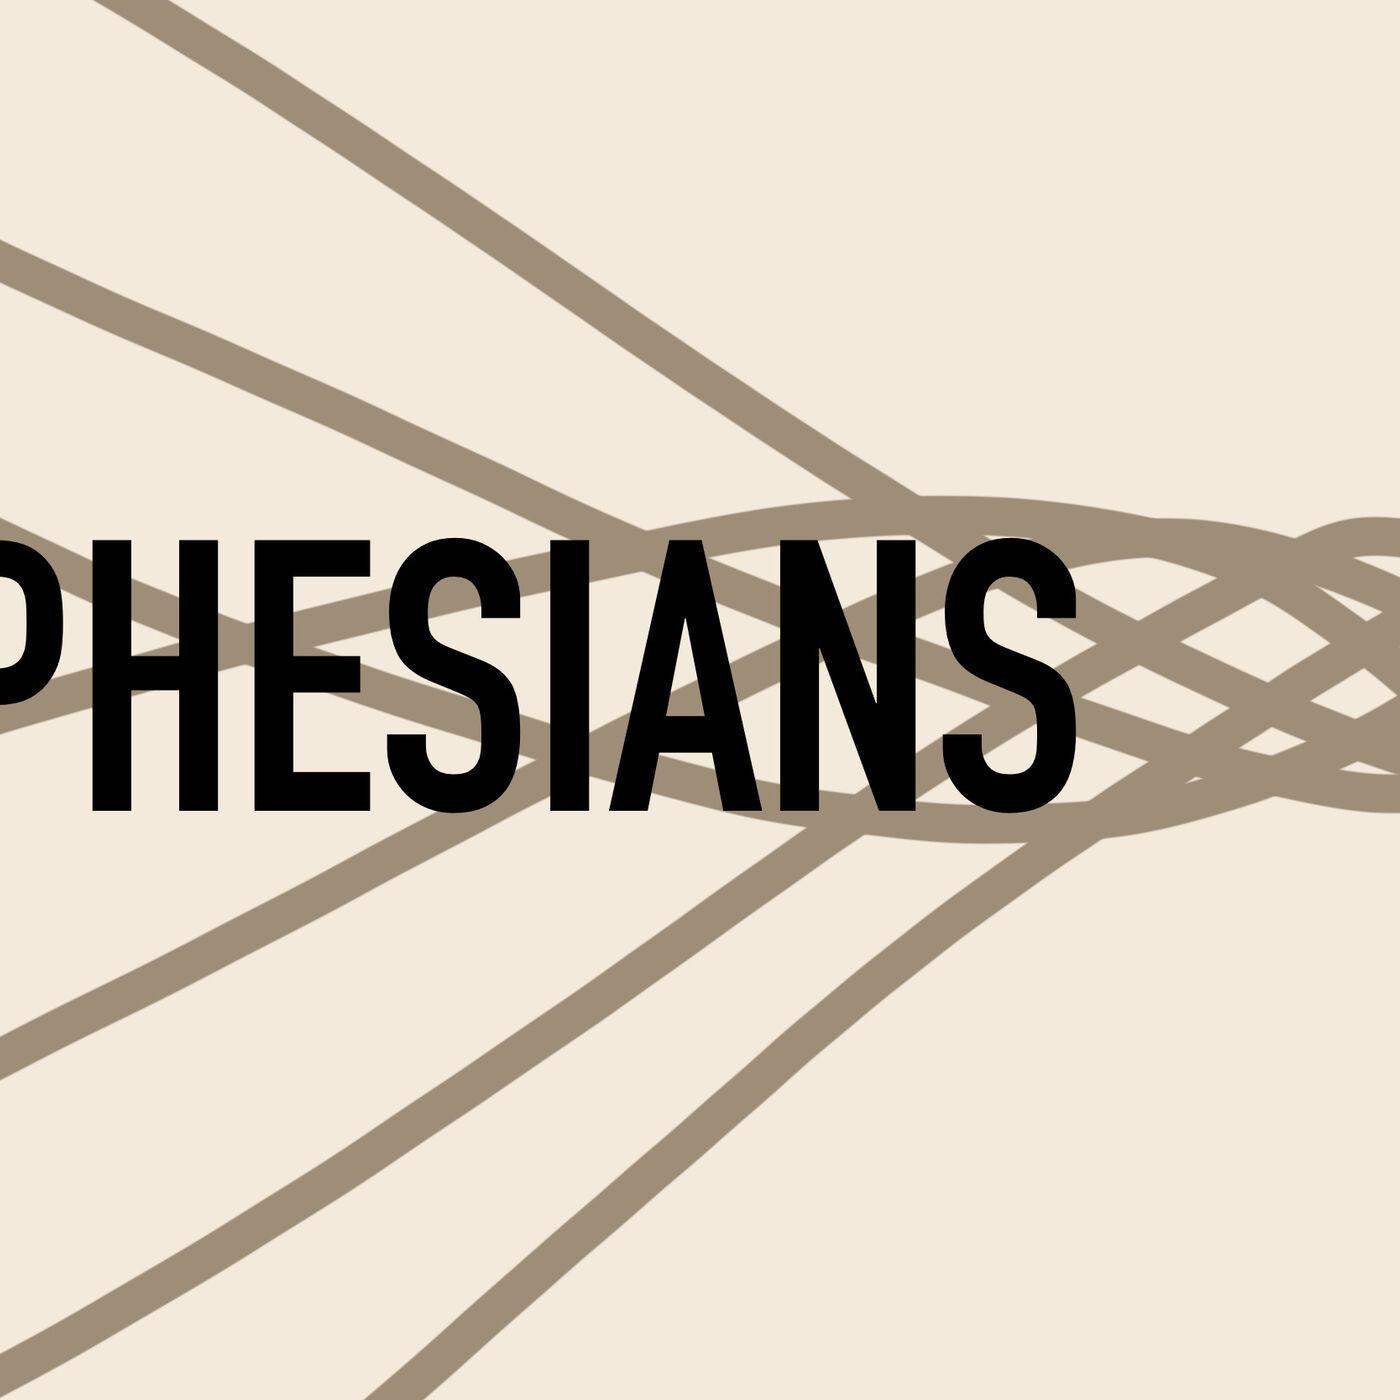 Ephesians 4:7-32 - Kindness, Compassion, and Forgiveness